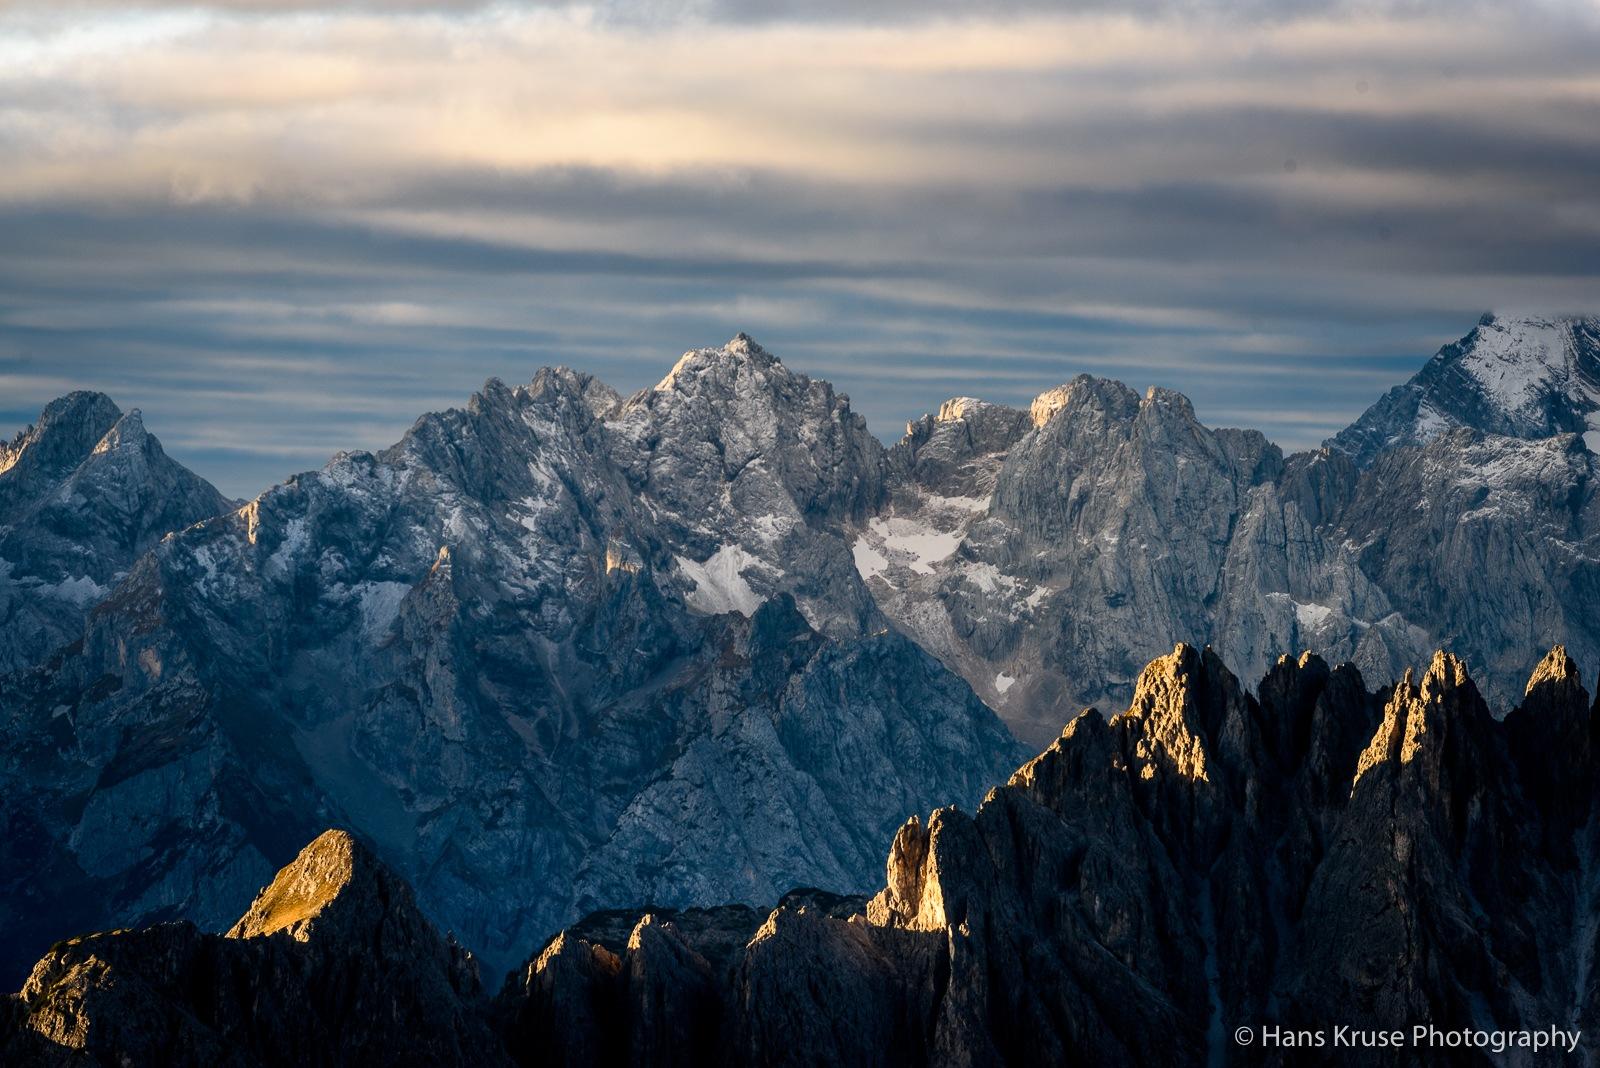 Morning light on the Cadini peaks by Hans Kruse